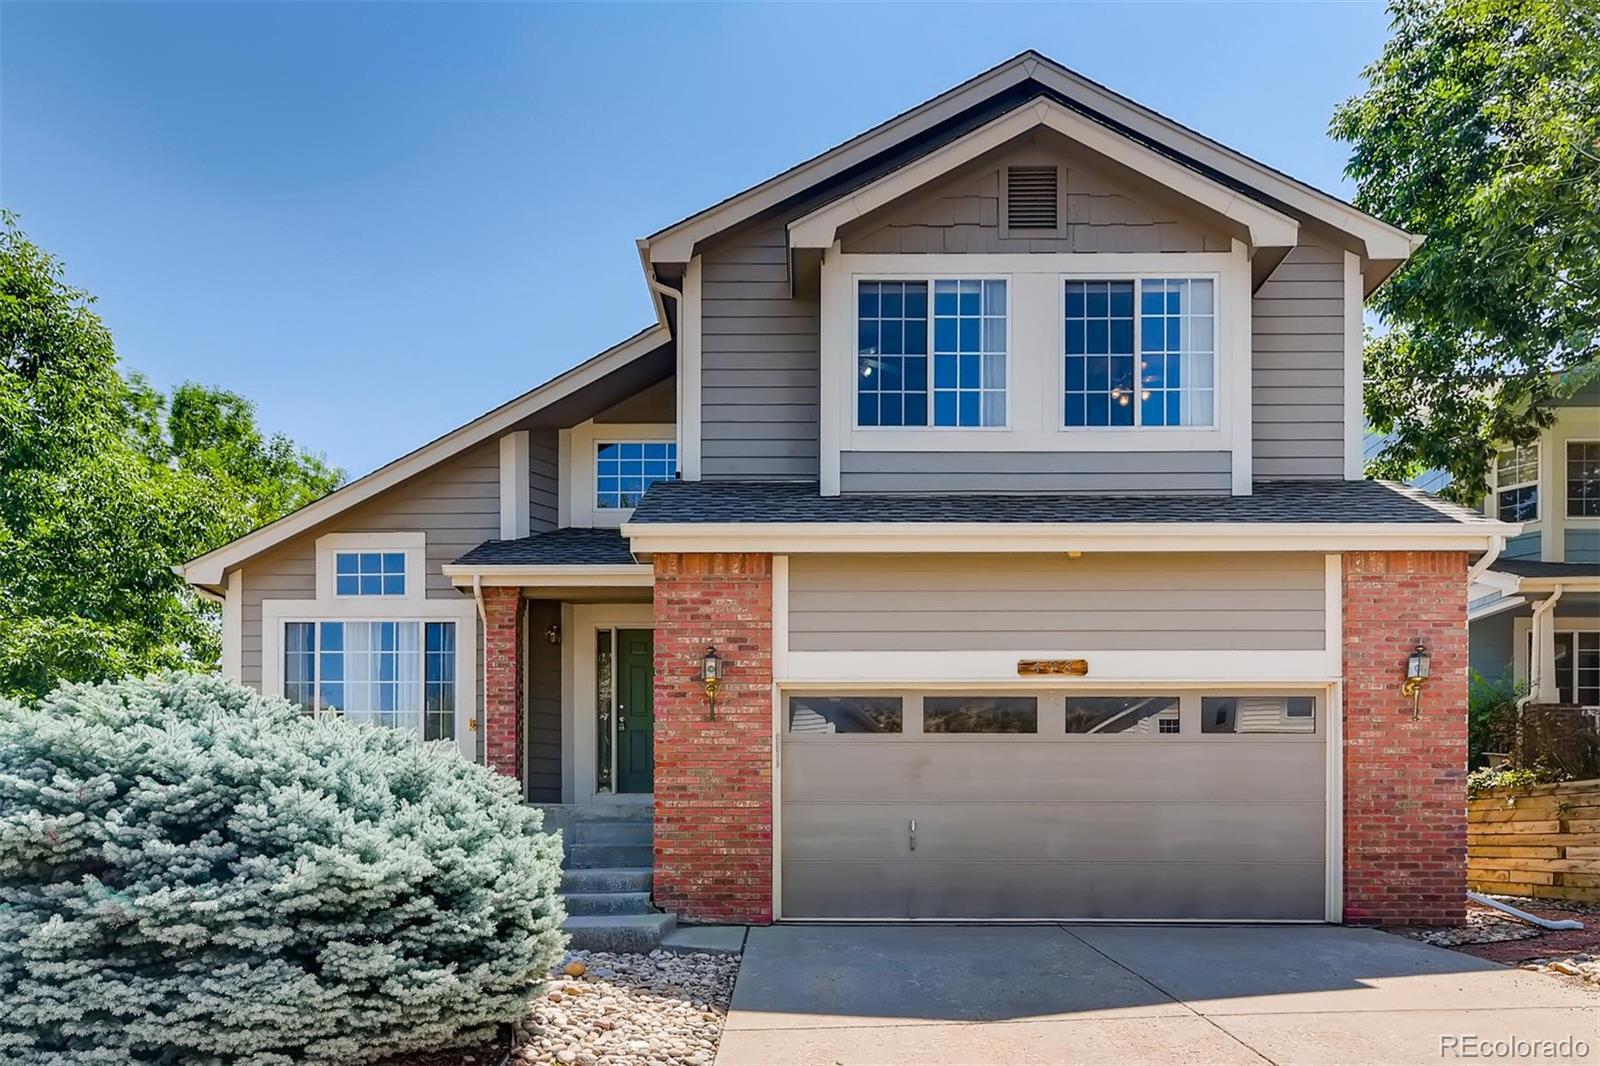 MLS# 9724731 - 1 - 498 Promontory Drive, Loveland, CO 80537